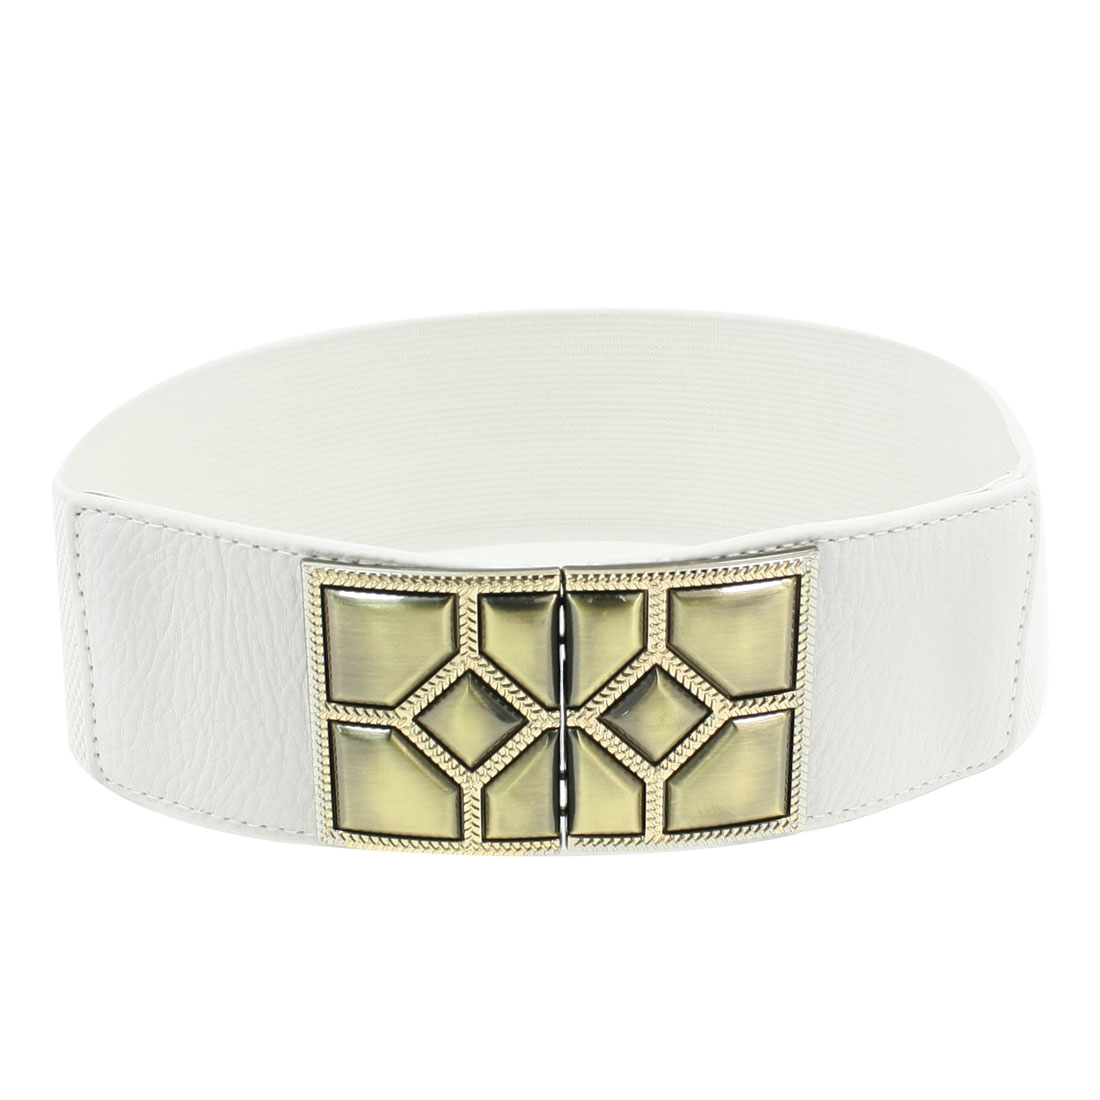 Faceted Interlocking Buckle 6cm Wide Elastic Cinch Belt for Ladies